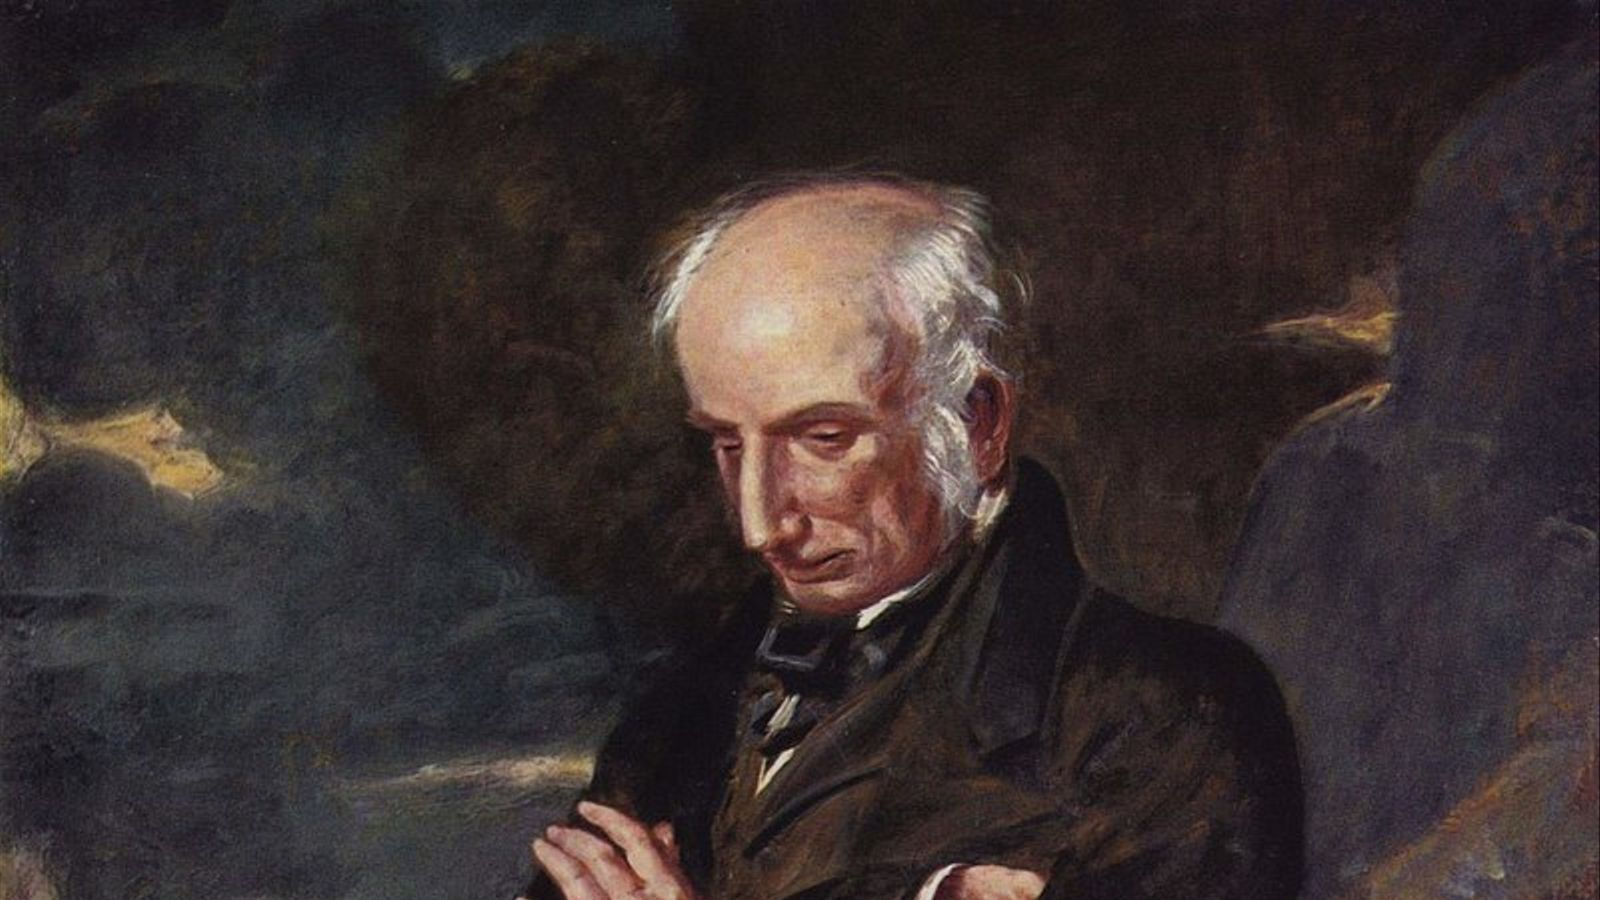 Wordsworth, pintat per Benjamin Robert Haydon